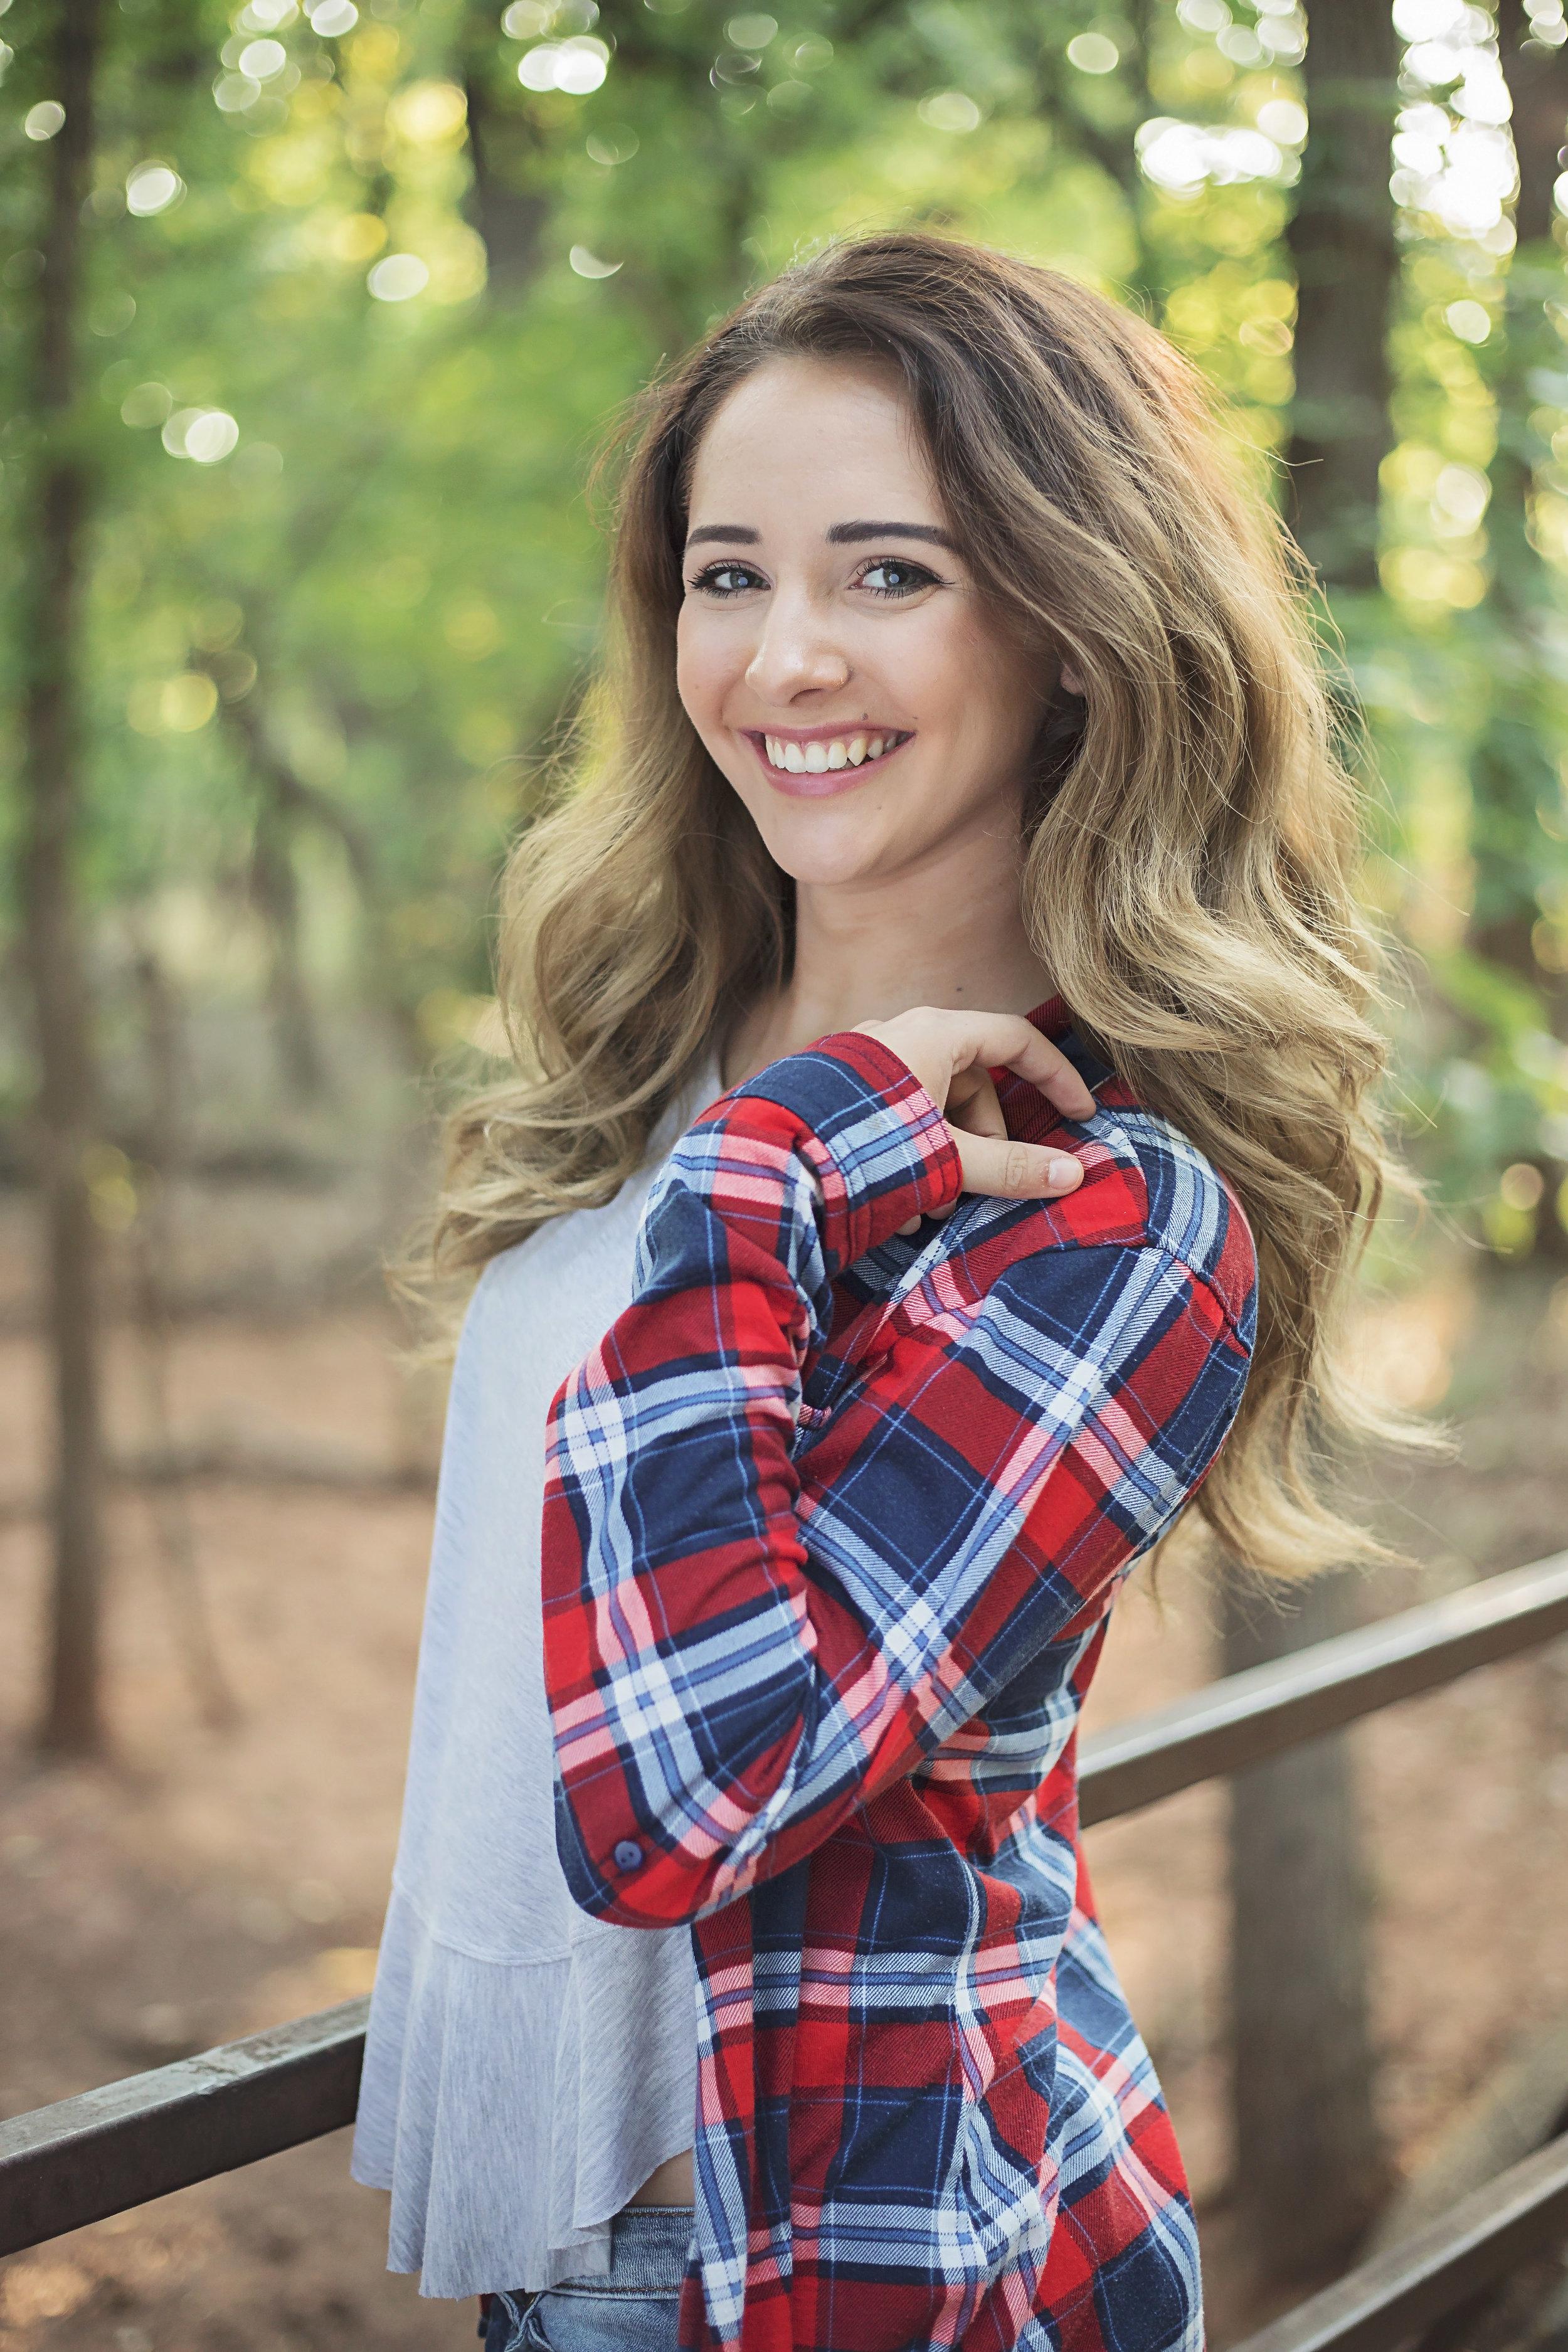 High school senior girl wearing red flannel at park in Oklahoma City. Oklahoma Senior Photographer Amanda Lynn.